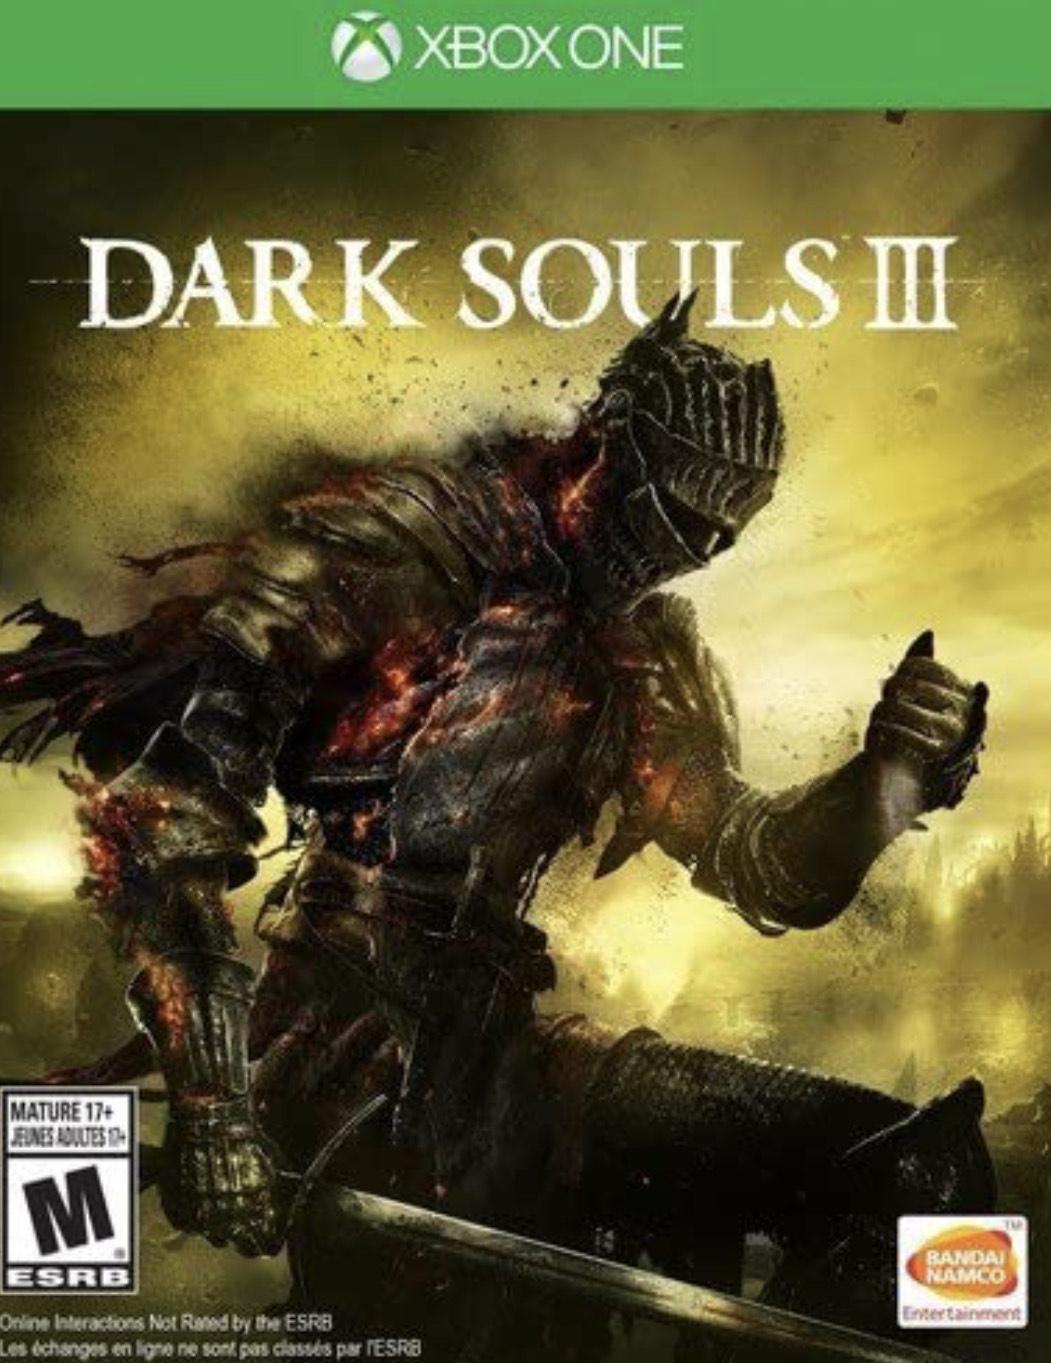 Amazon: Dark Souls III - Xbox One - Standard Edition